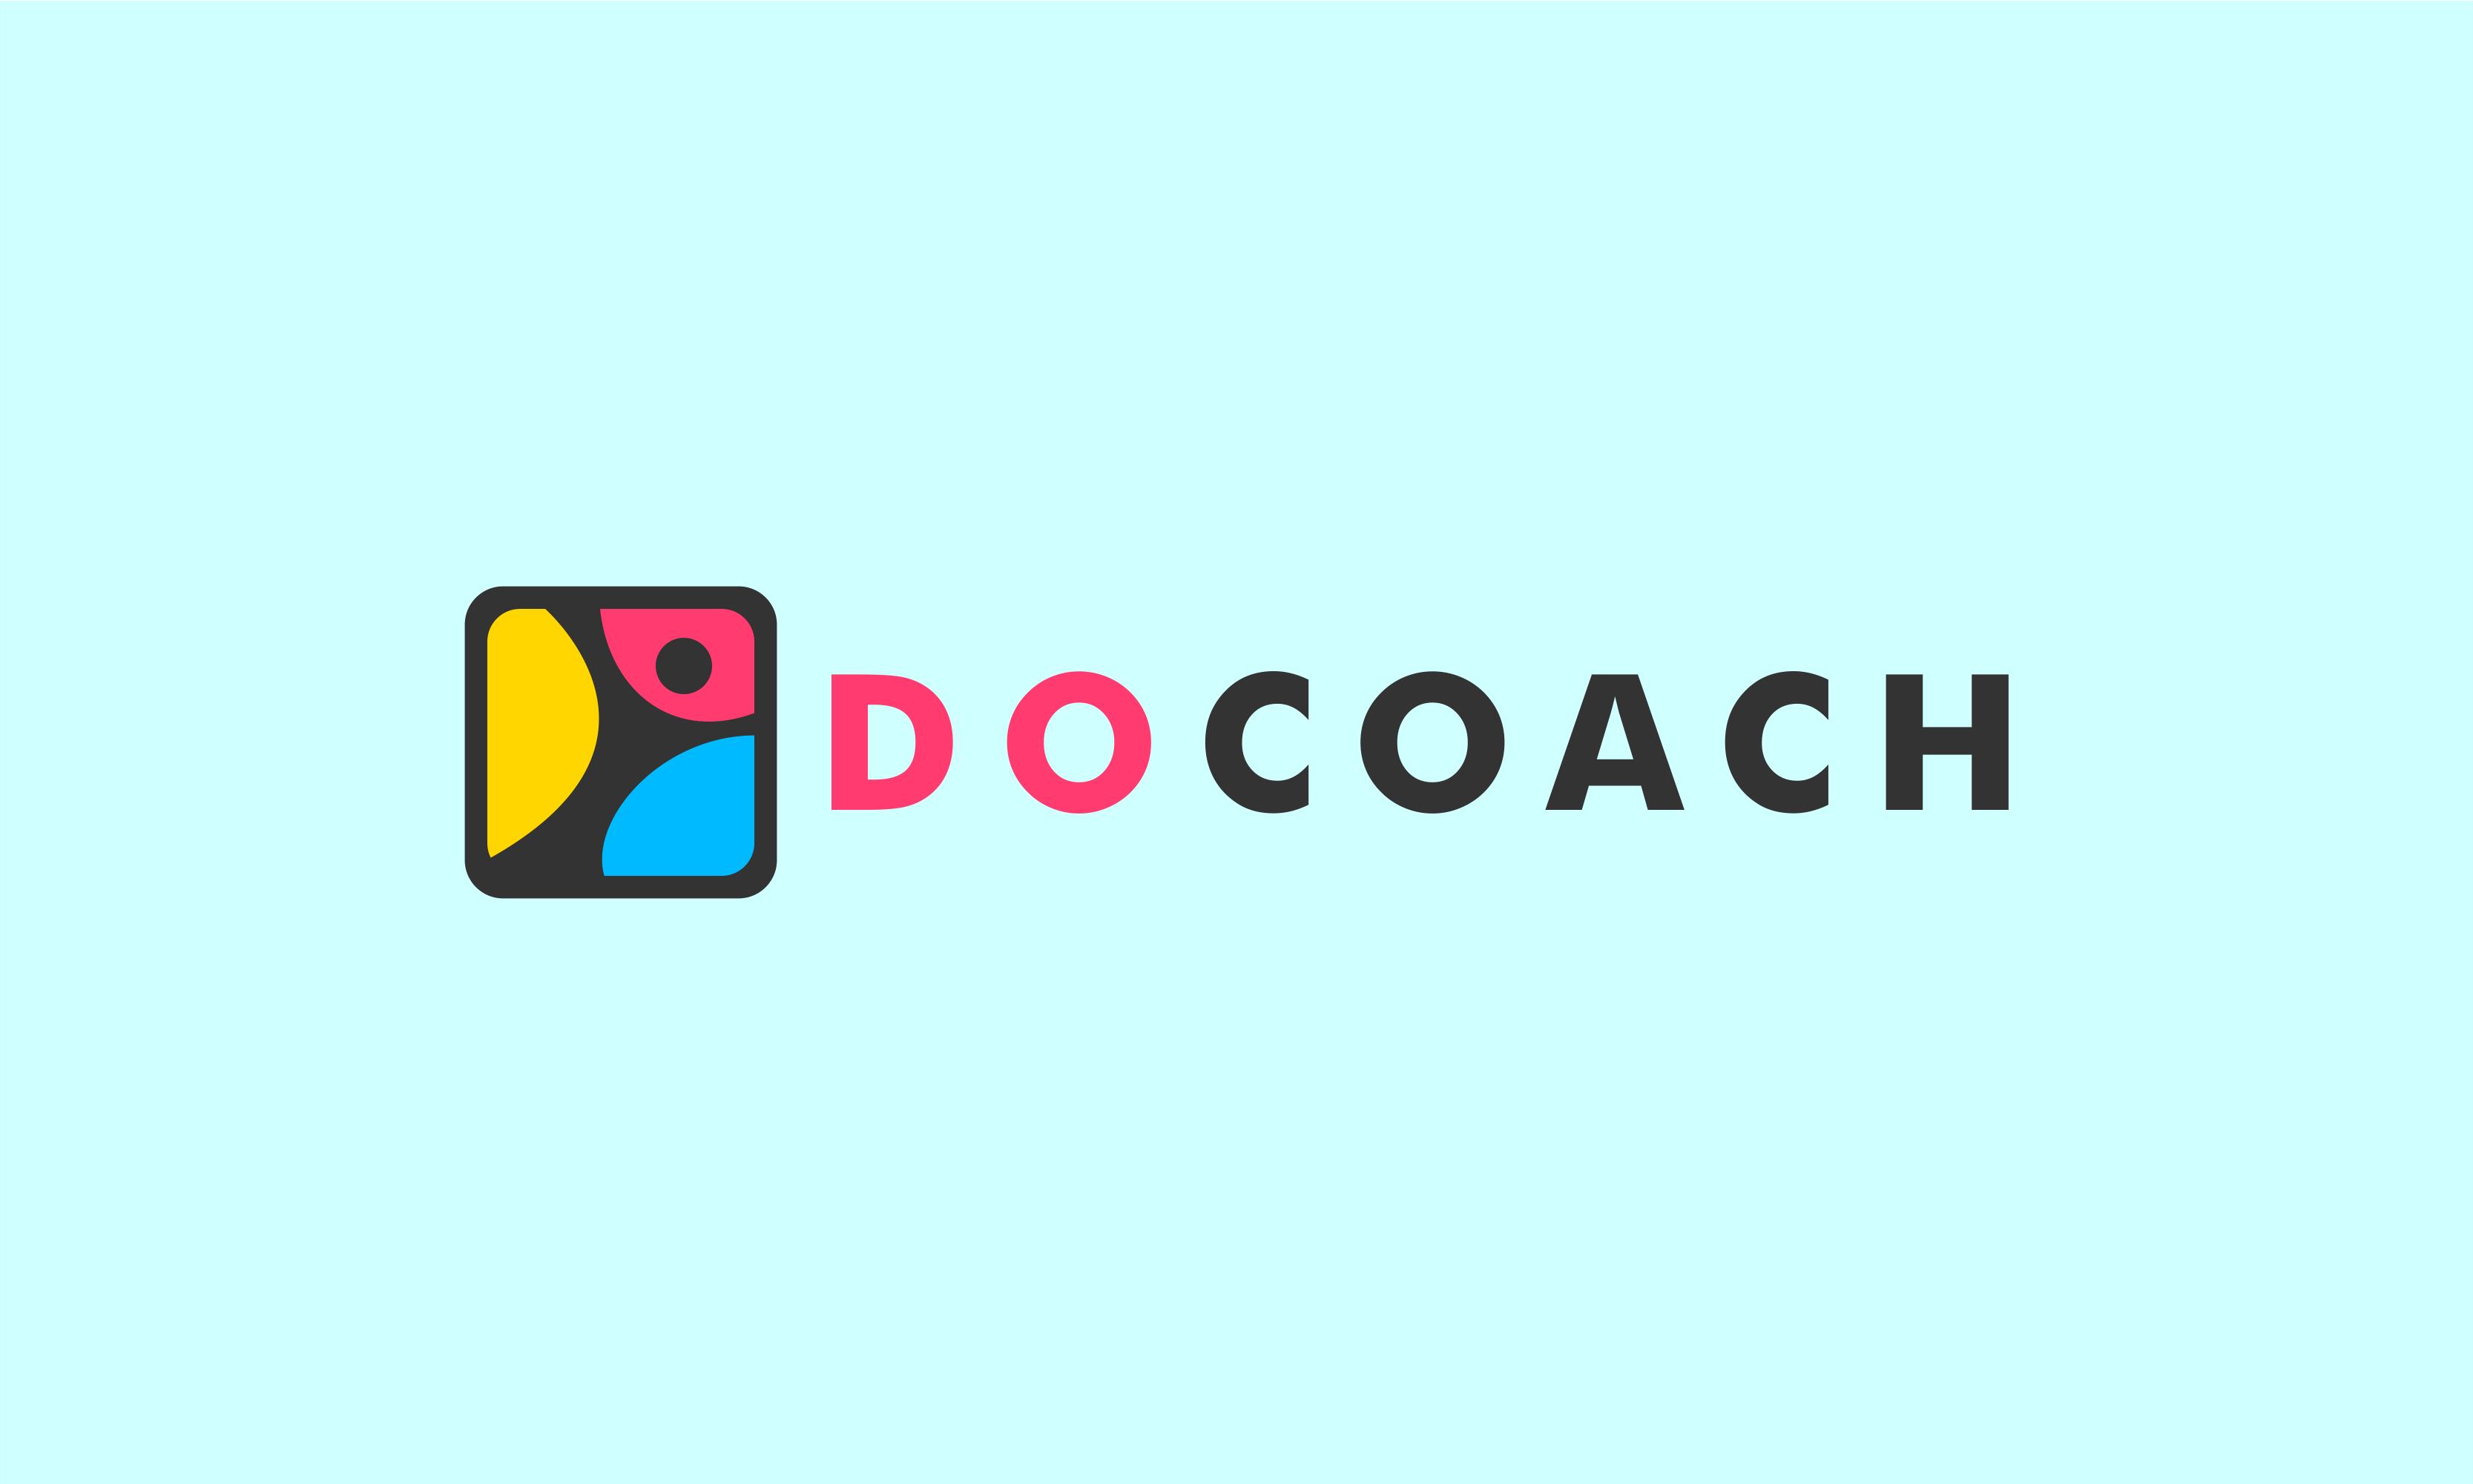 Docoach